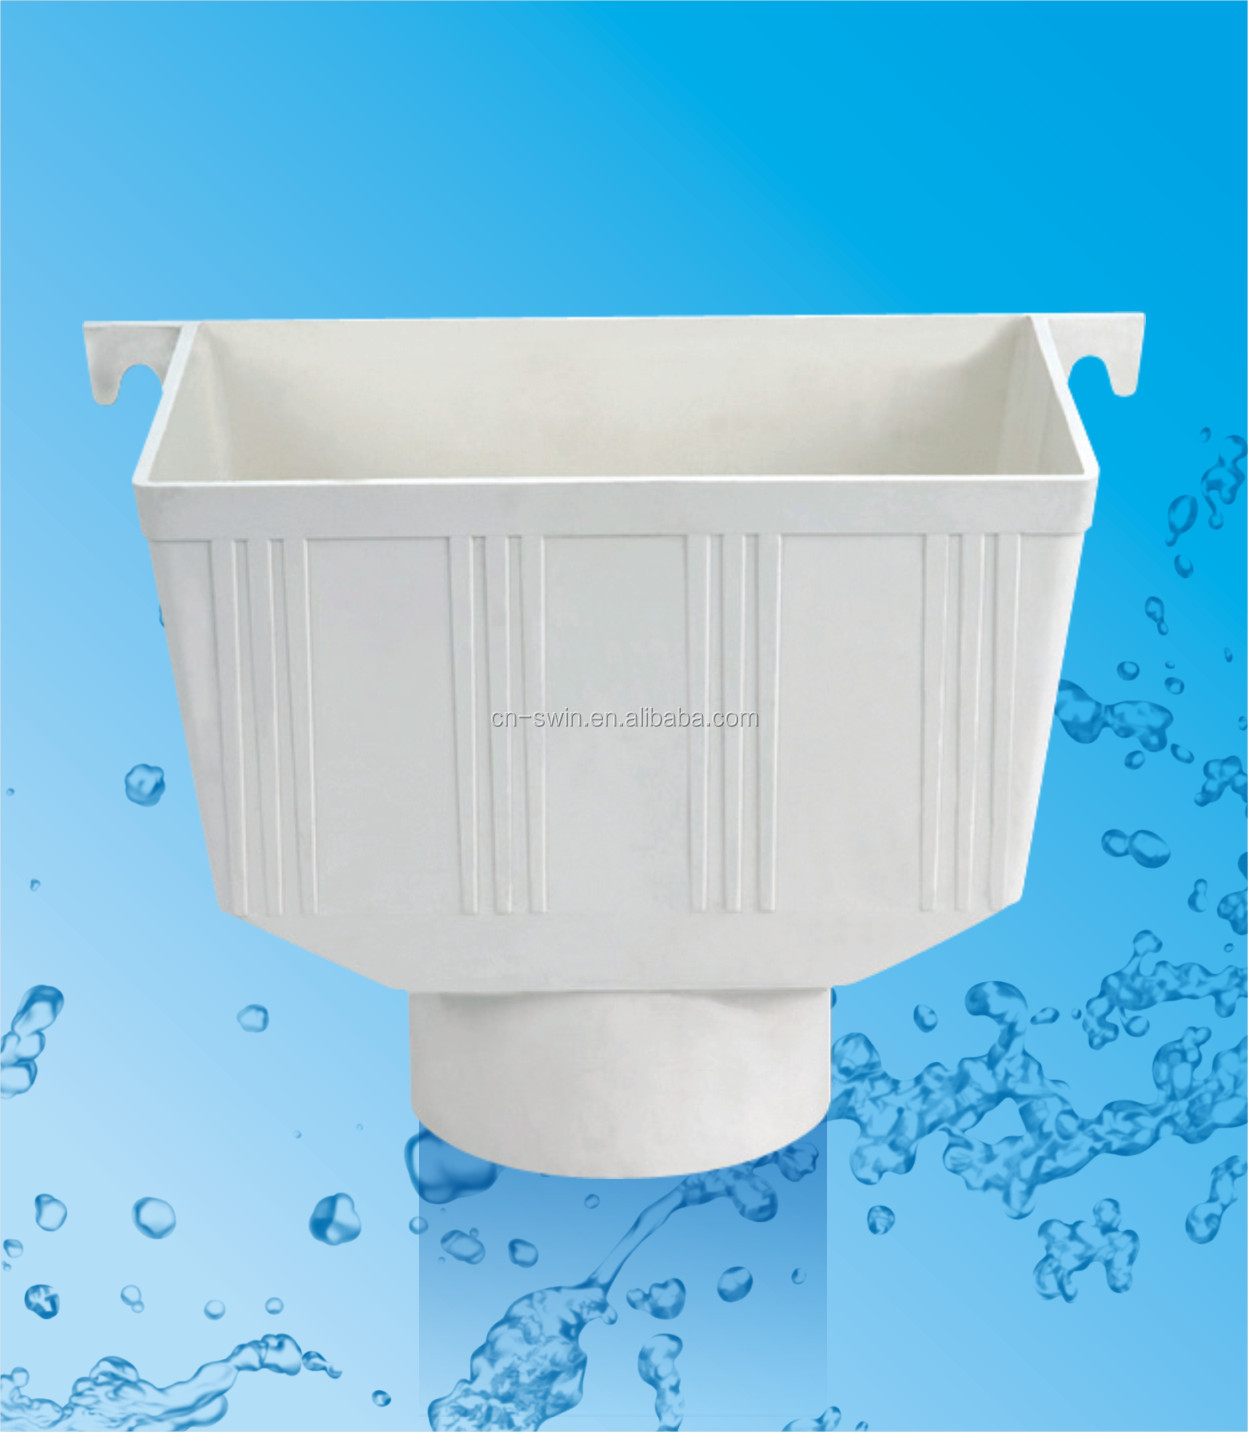 4 Inch Pvc Water Pipe Fitting Rain Roof Drain Water